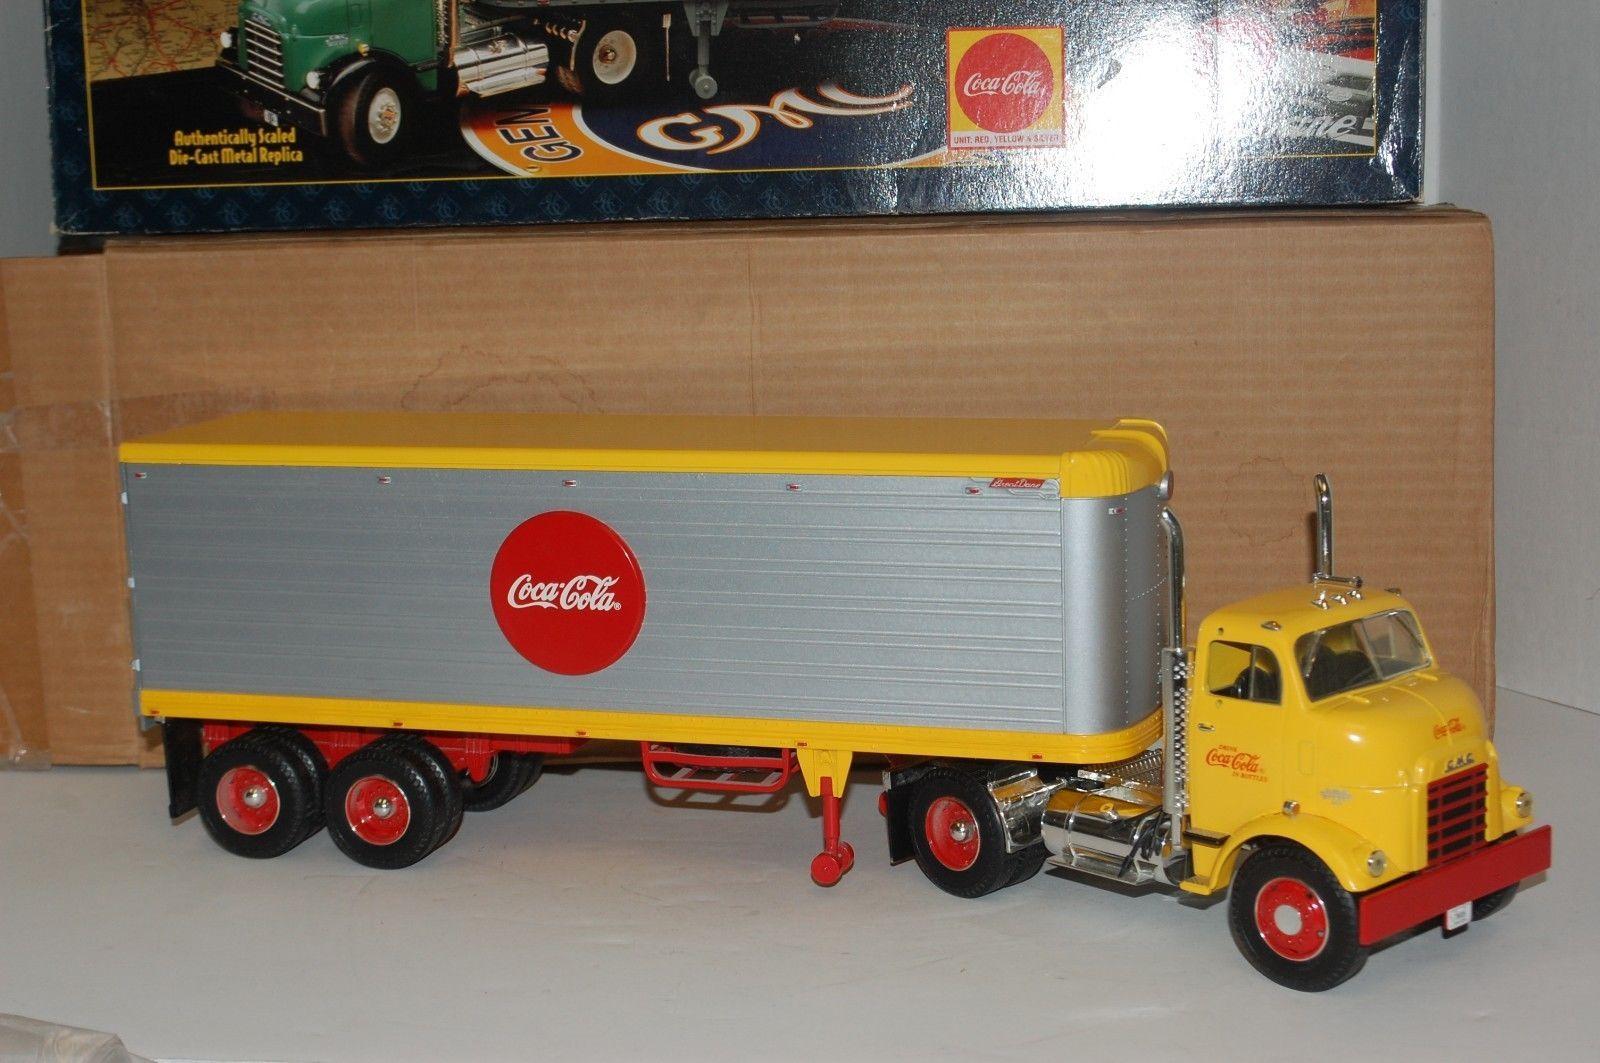 Ertl Coca-Cola GMC Diesel Coke Tractor Trailer Silver 1:25 w/ Stock Box KB 59F https://t.co/g0DVZ66TOi https://t.co/DtTNpzoHpM